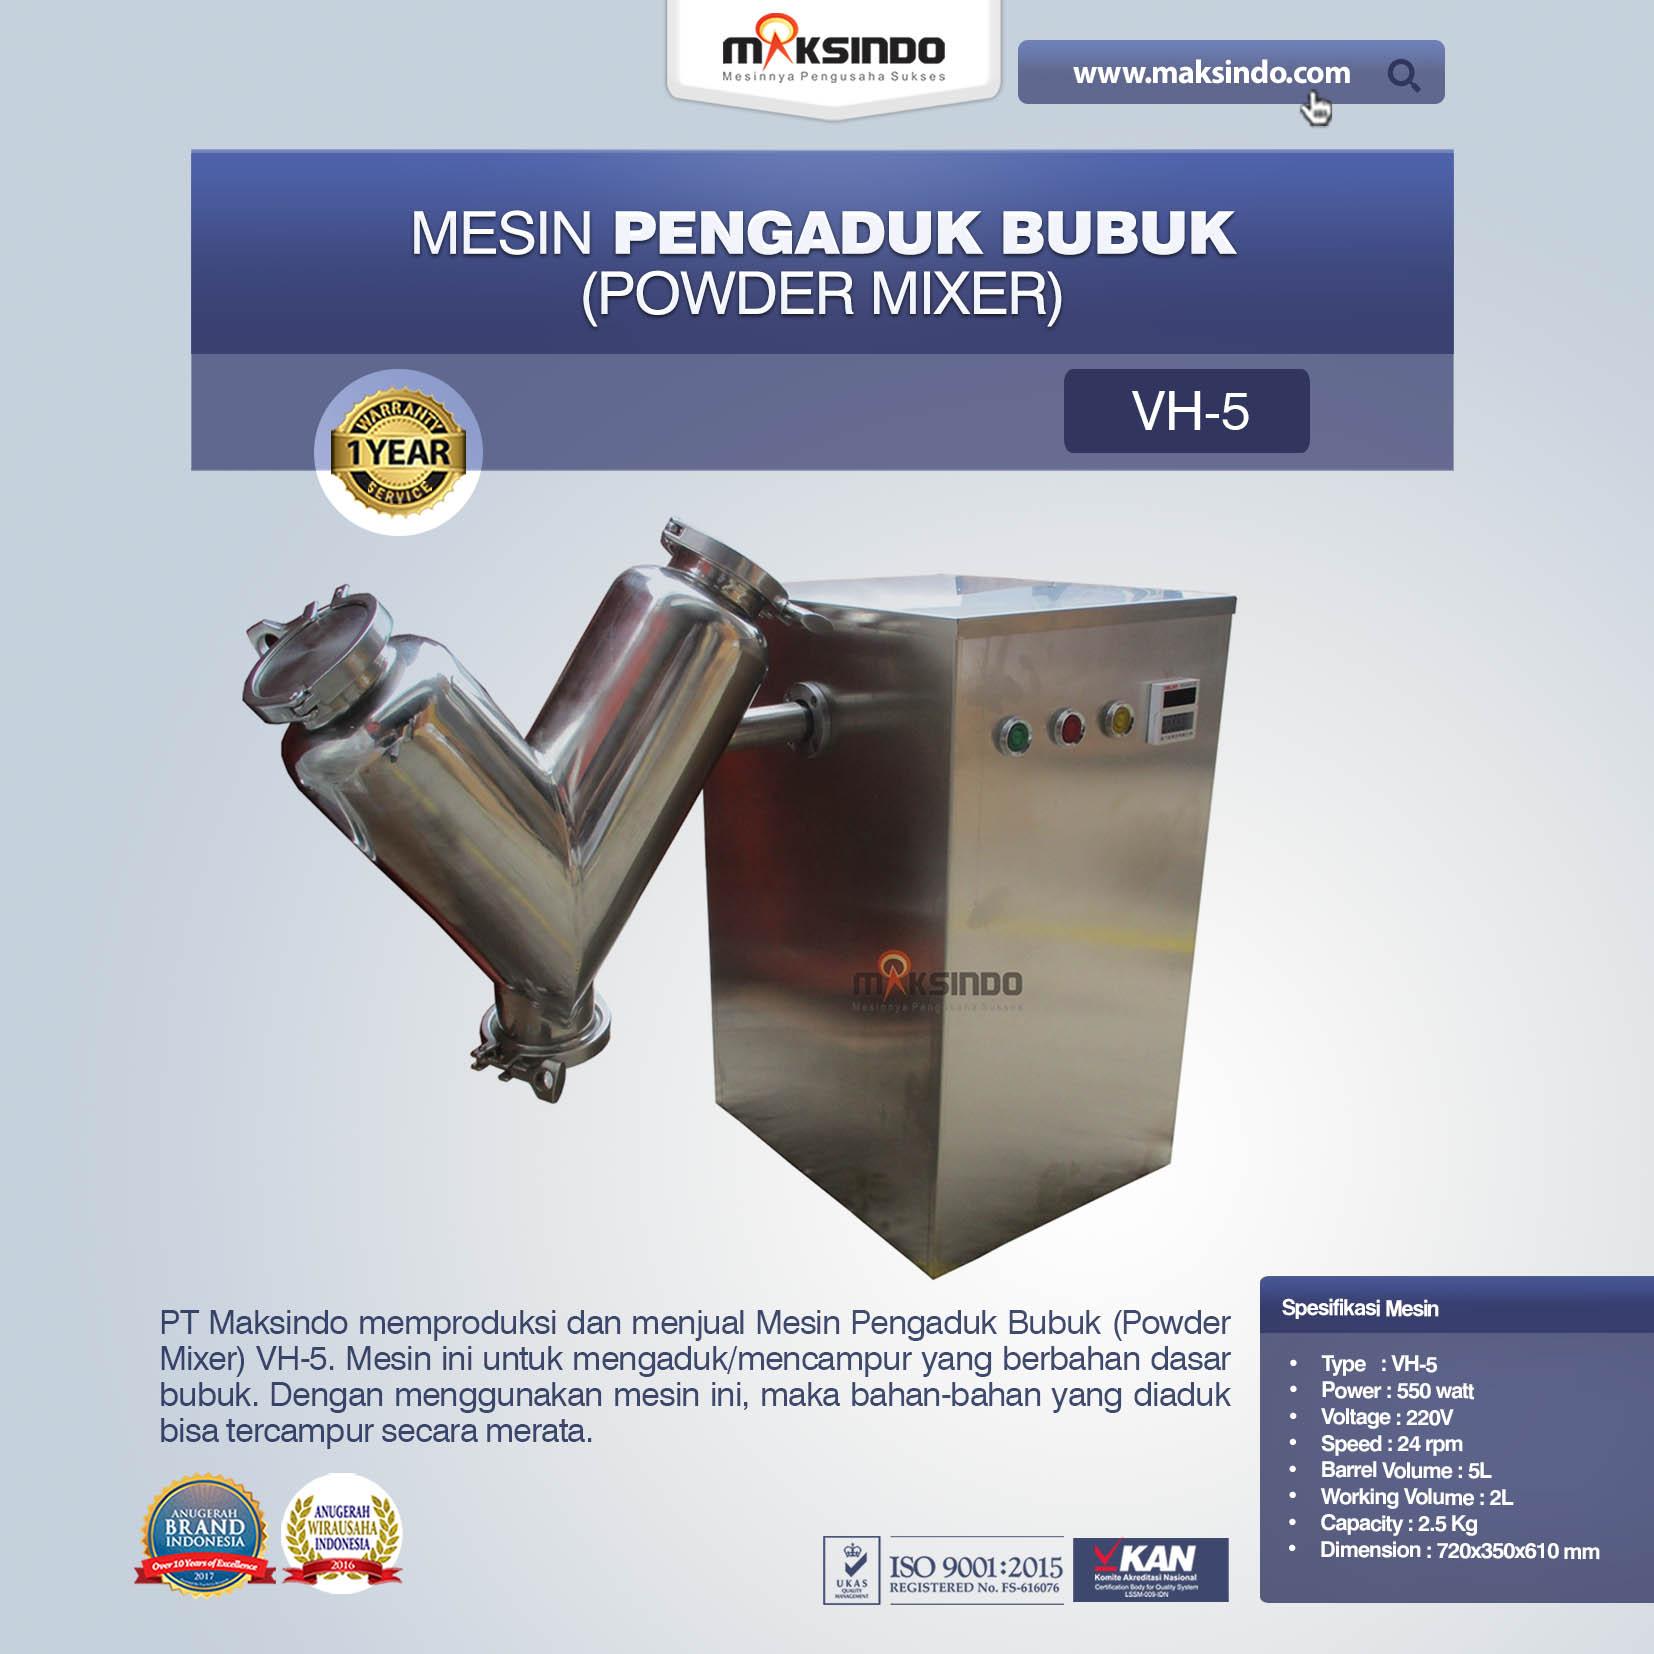 Jual Mesin Pengaduk Bubuk (Powder Mixer) VH-5 di Tangerang